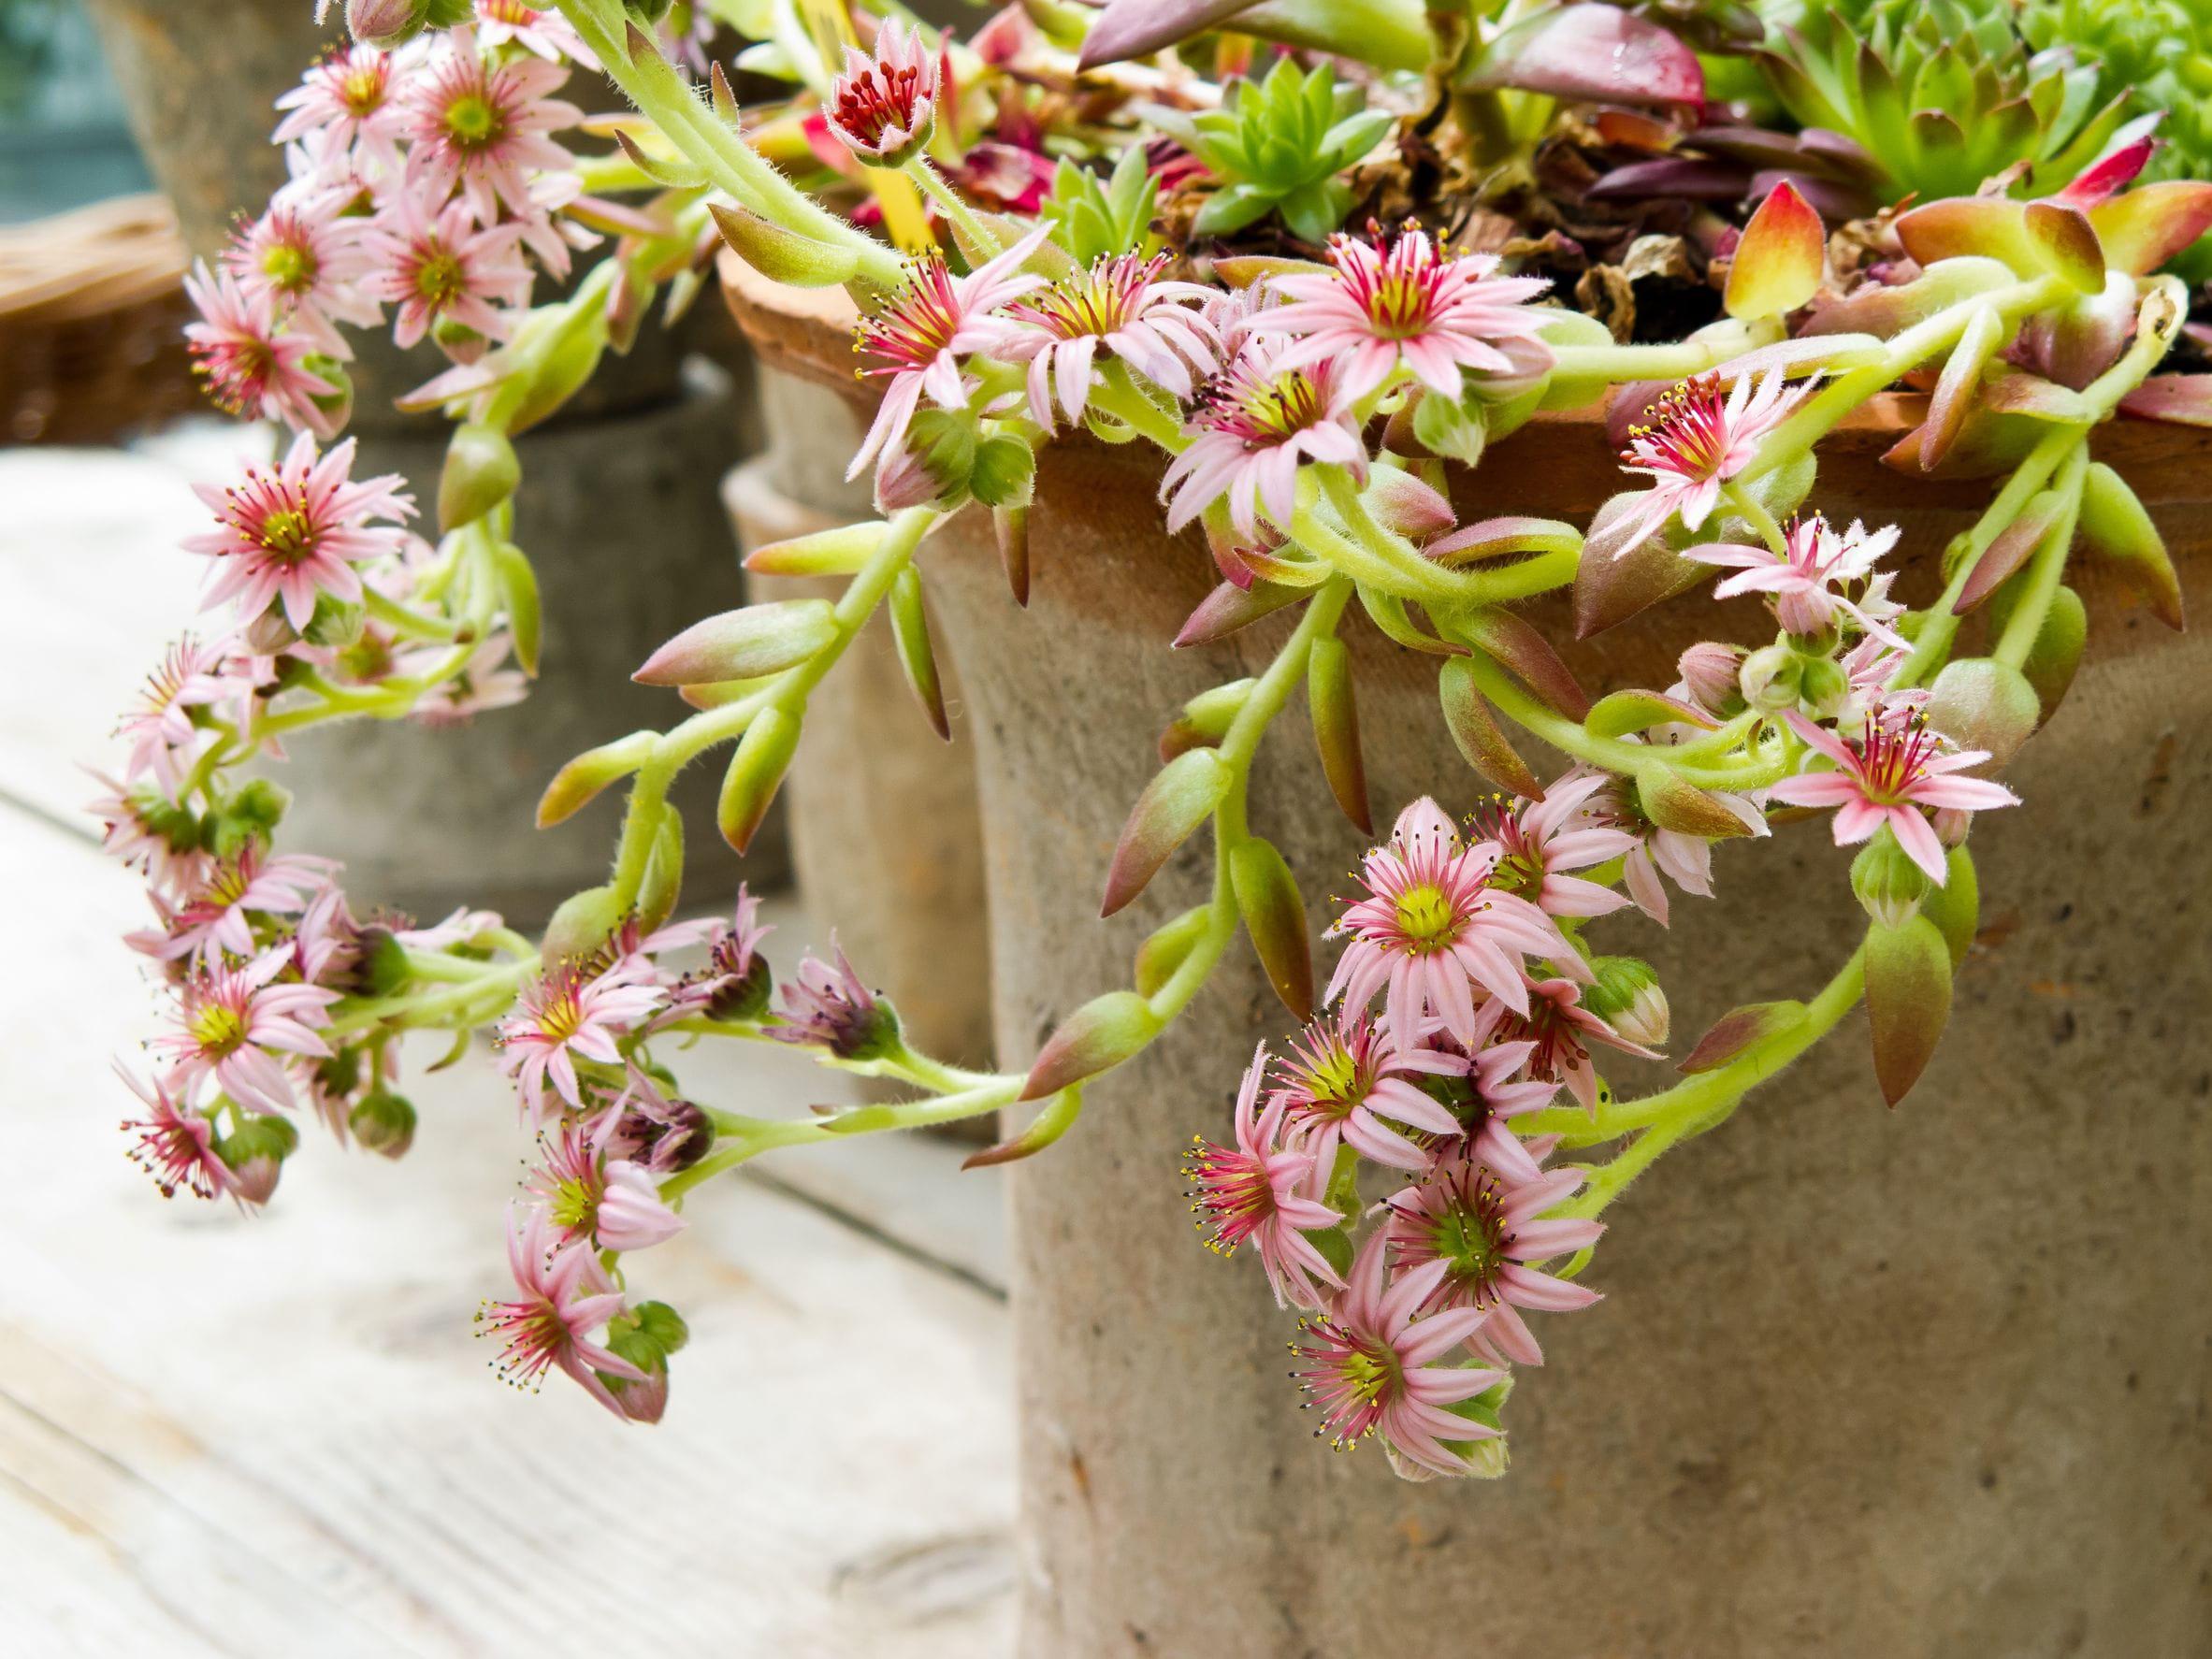 Orpin en fleurs © Ann Louise B Holmstrom Hagevi 123RF 46bcb97d7c6